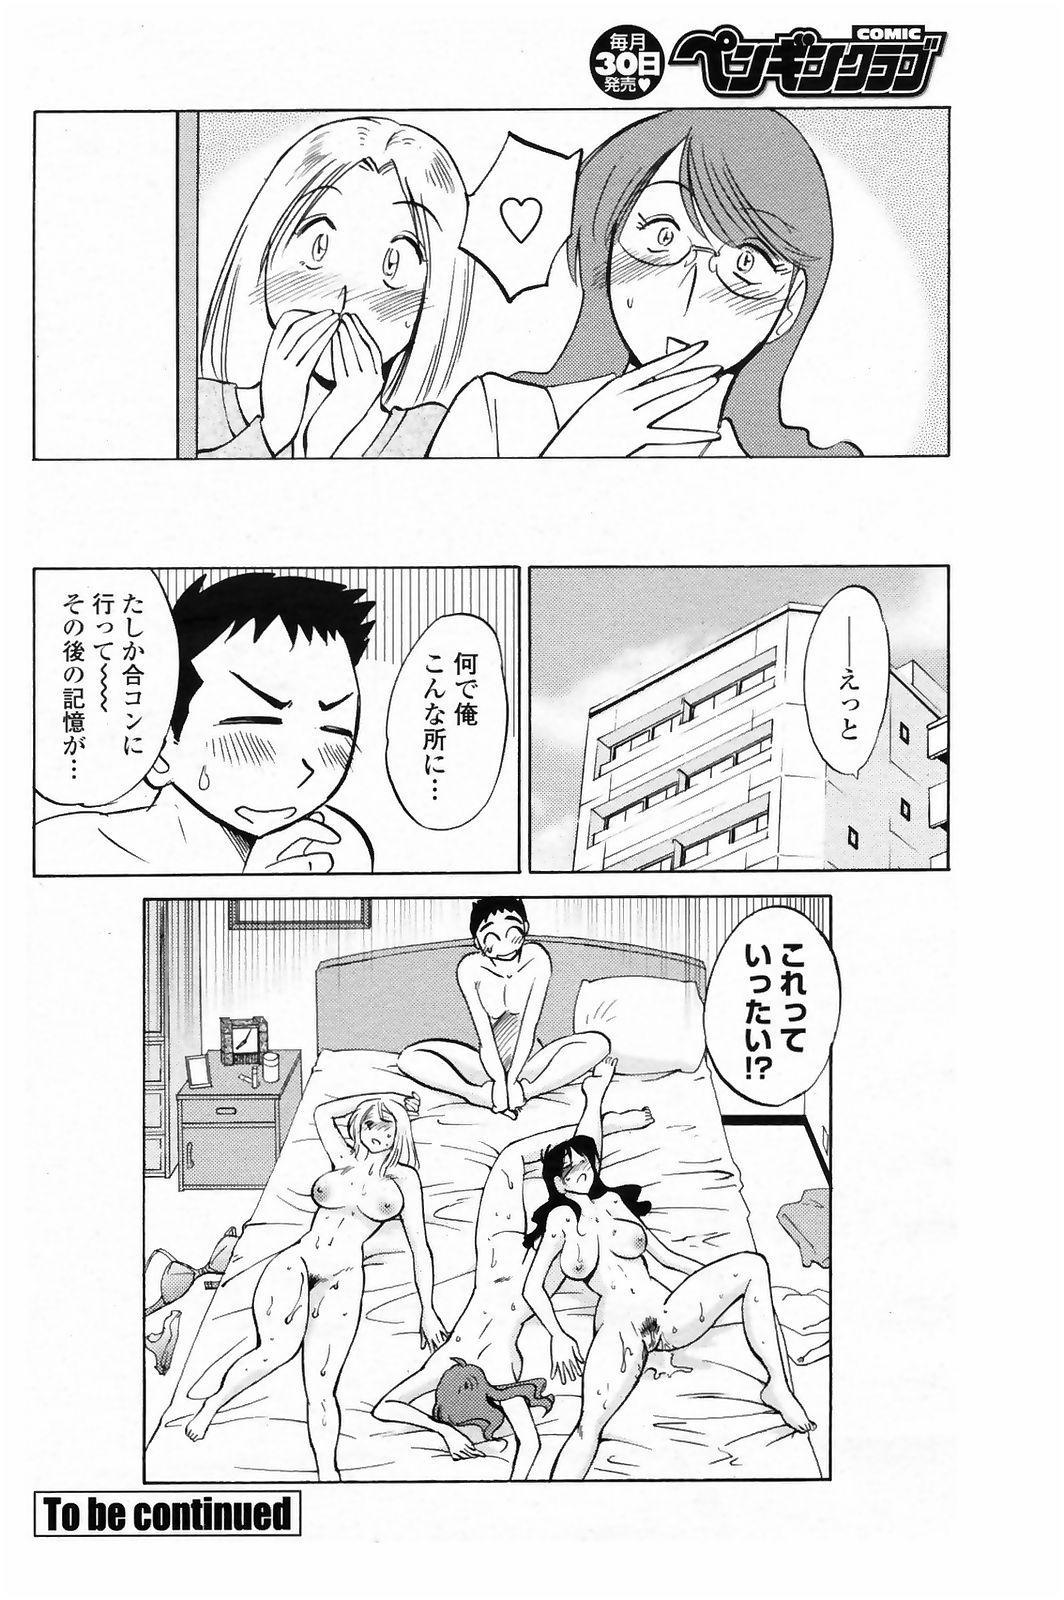 [Tsuyatsuya] Azumi-kun to Issho chapt.1-5 (Comic Penguin Club) 78